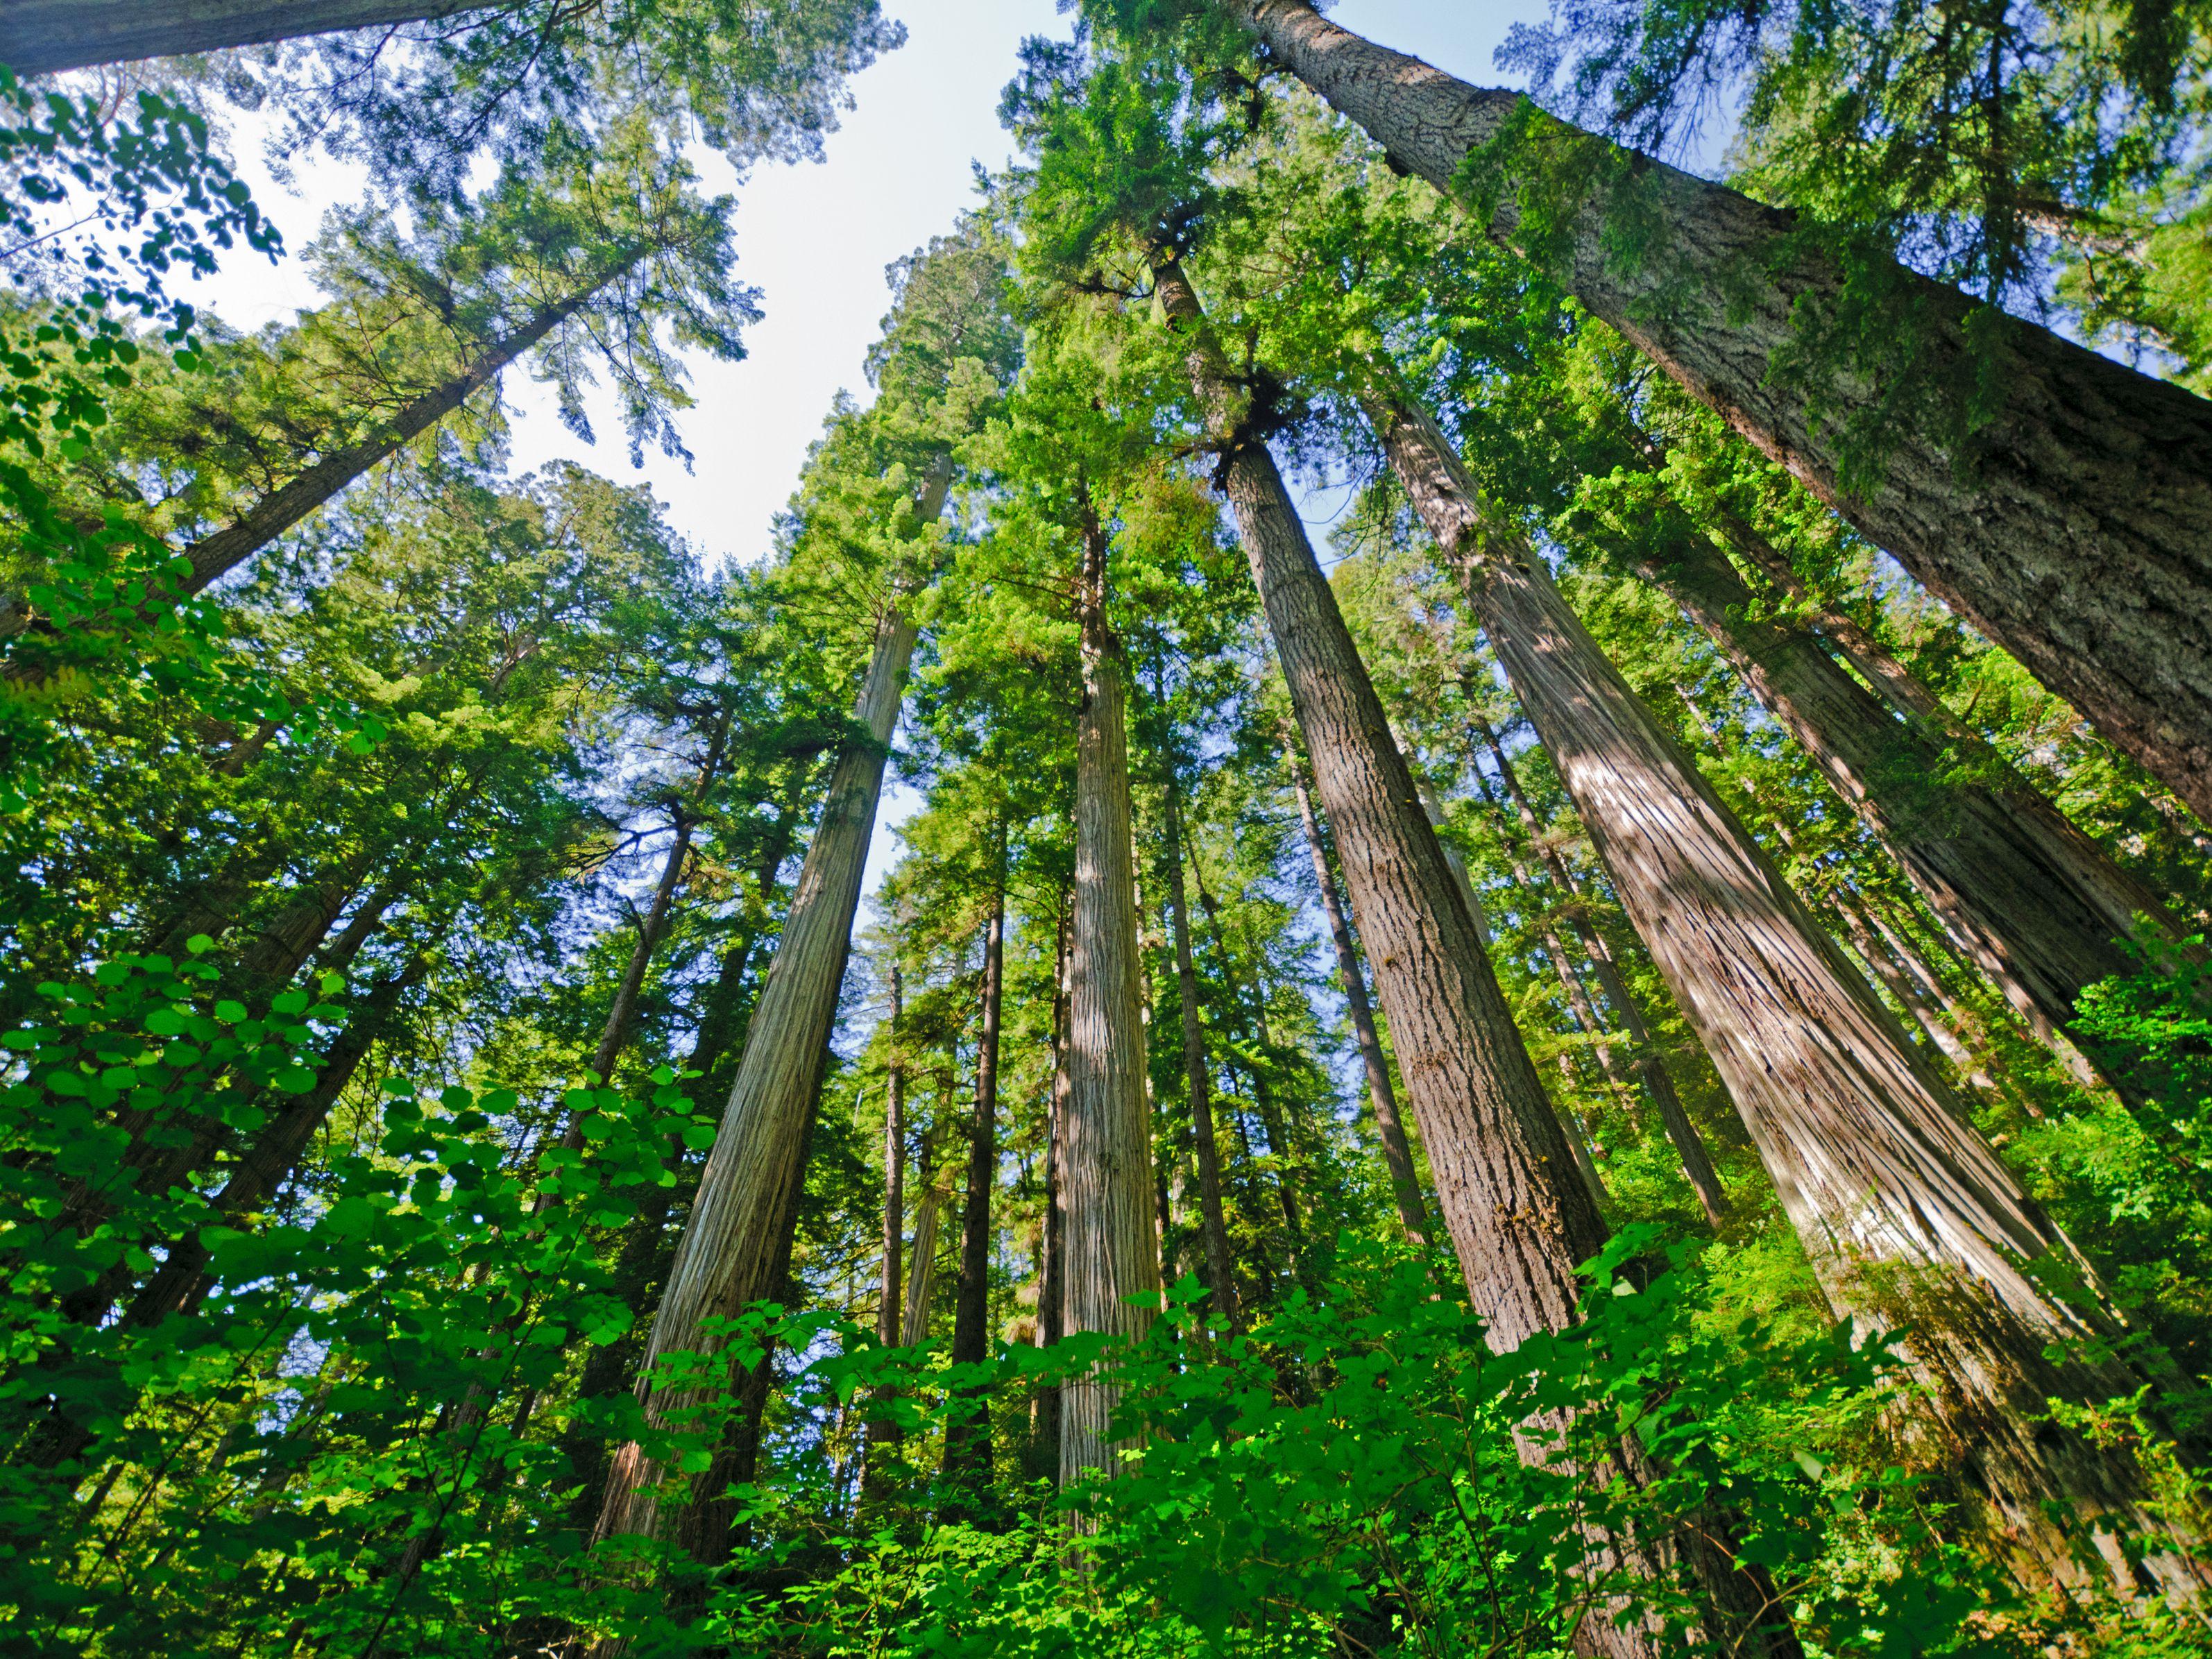 Coast Redwoods: Majestic Giants Benefit All Humankind